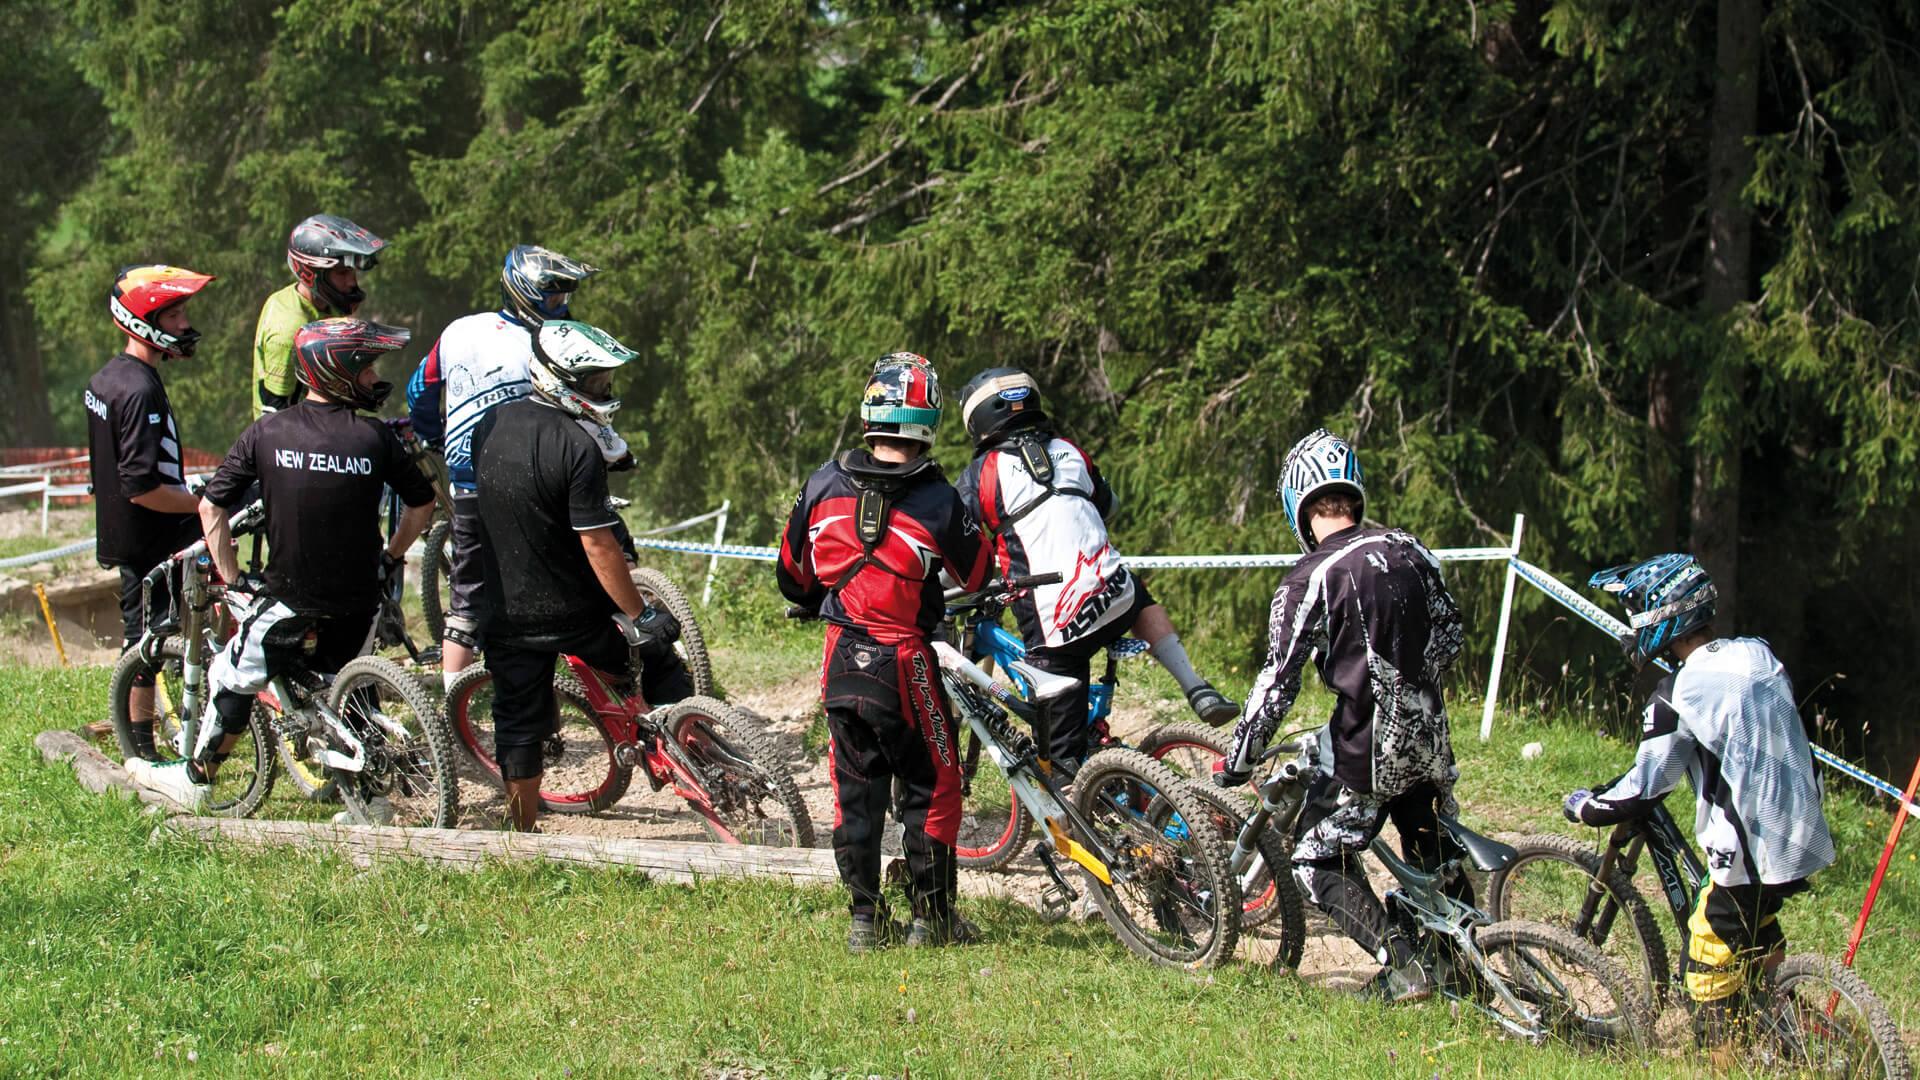 wiriehorn-downhill-sommer-rasant-gruppe